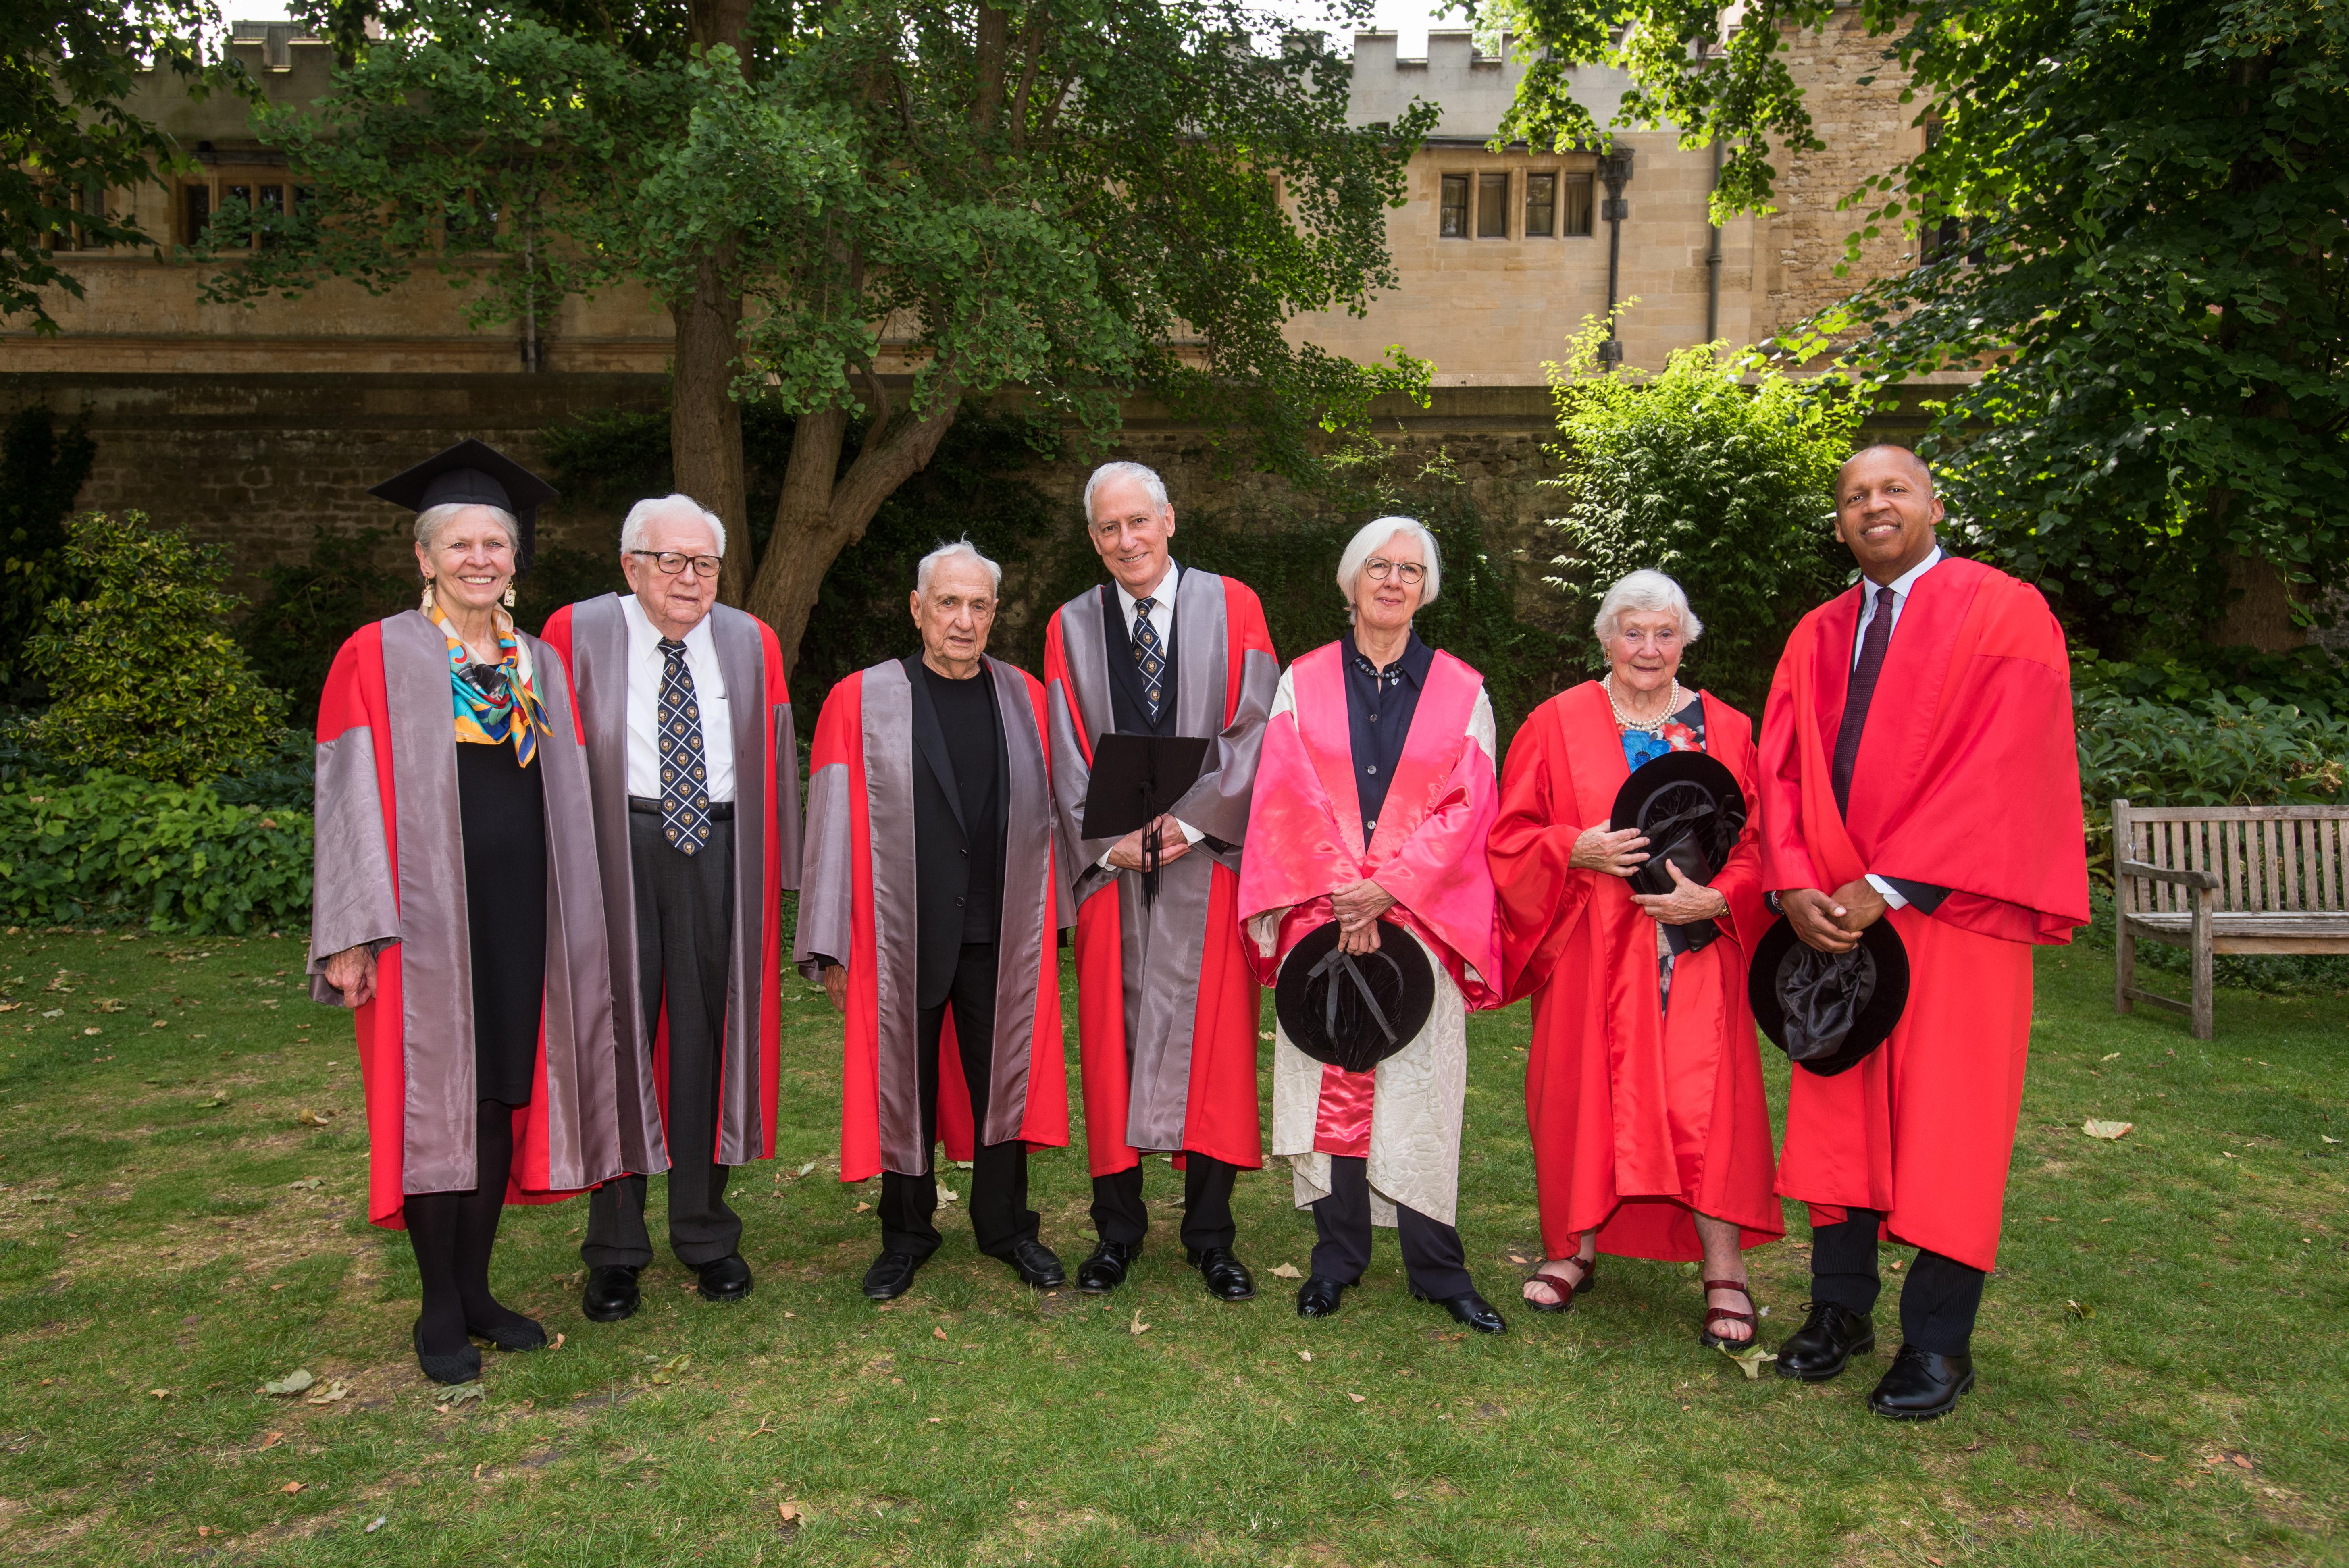 Seven eminent figures awarded honorary degrees at Encaenia